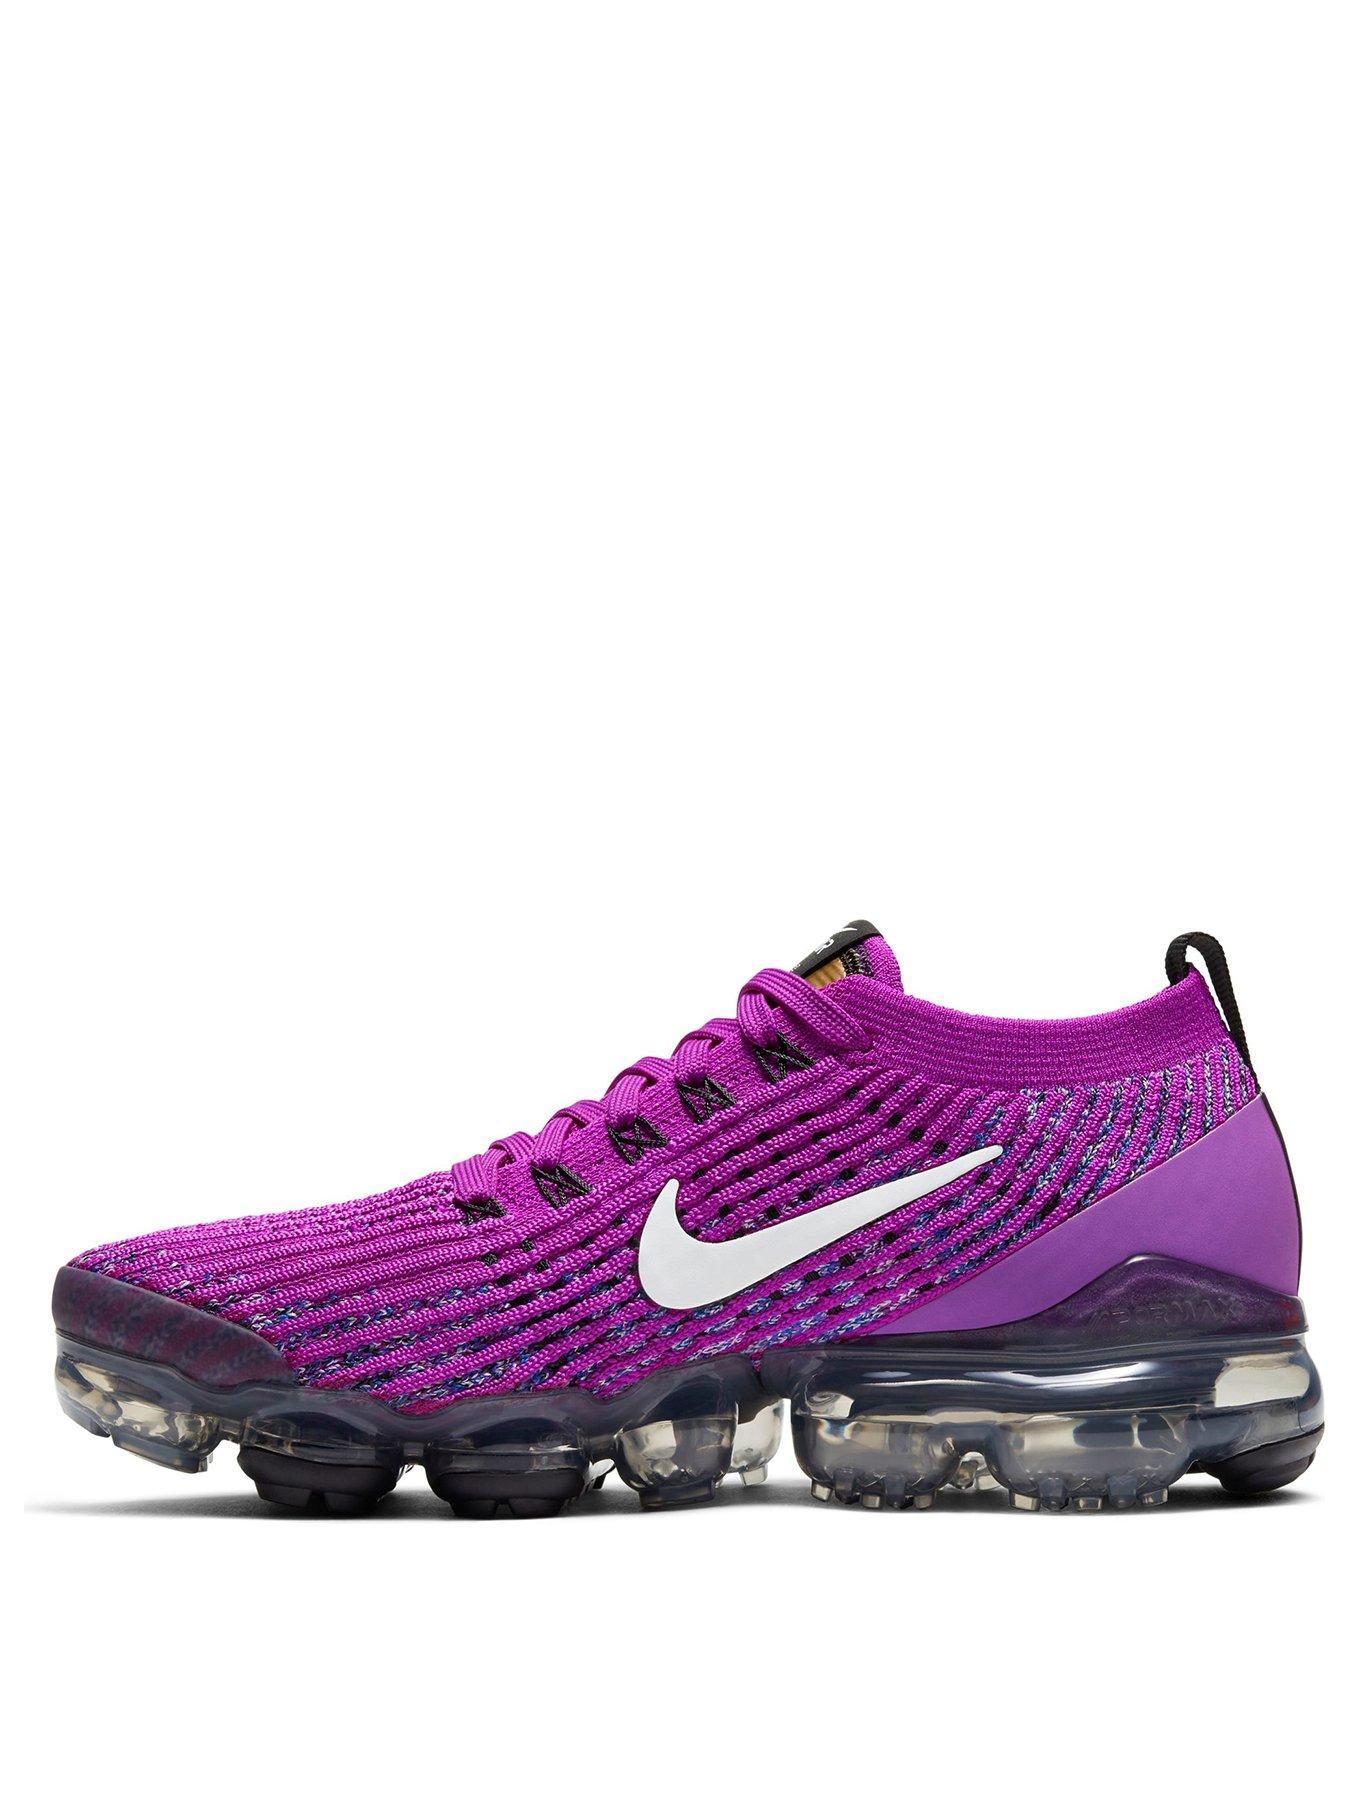 Nike Air Vapormax Flyknit 3 - Purple